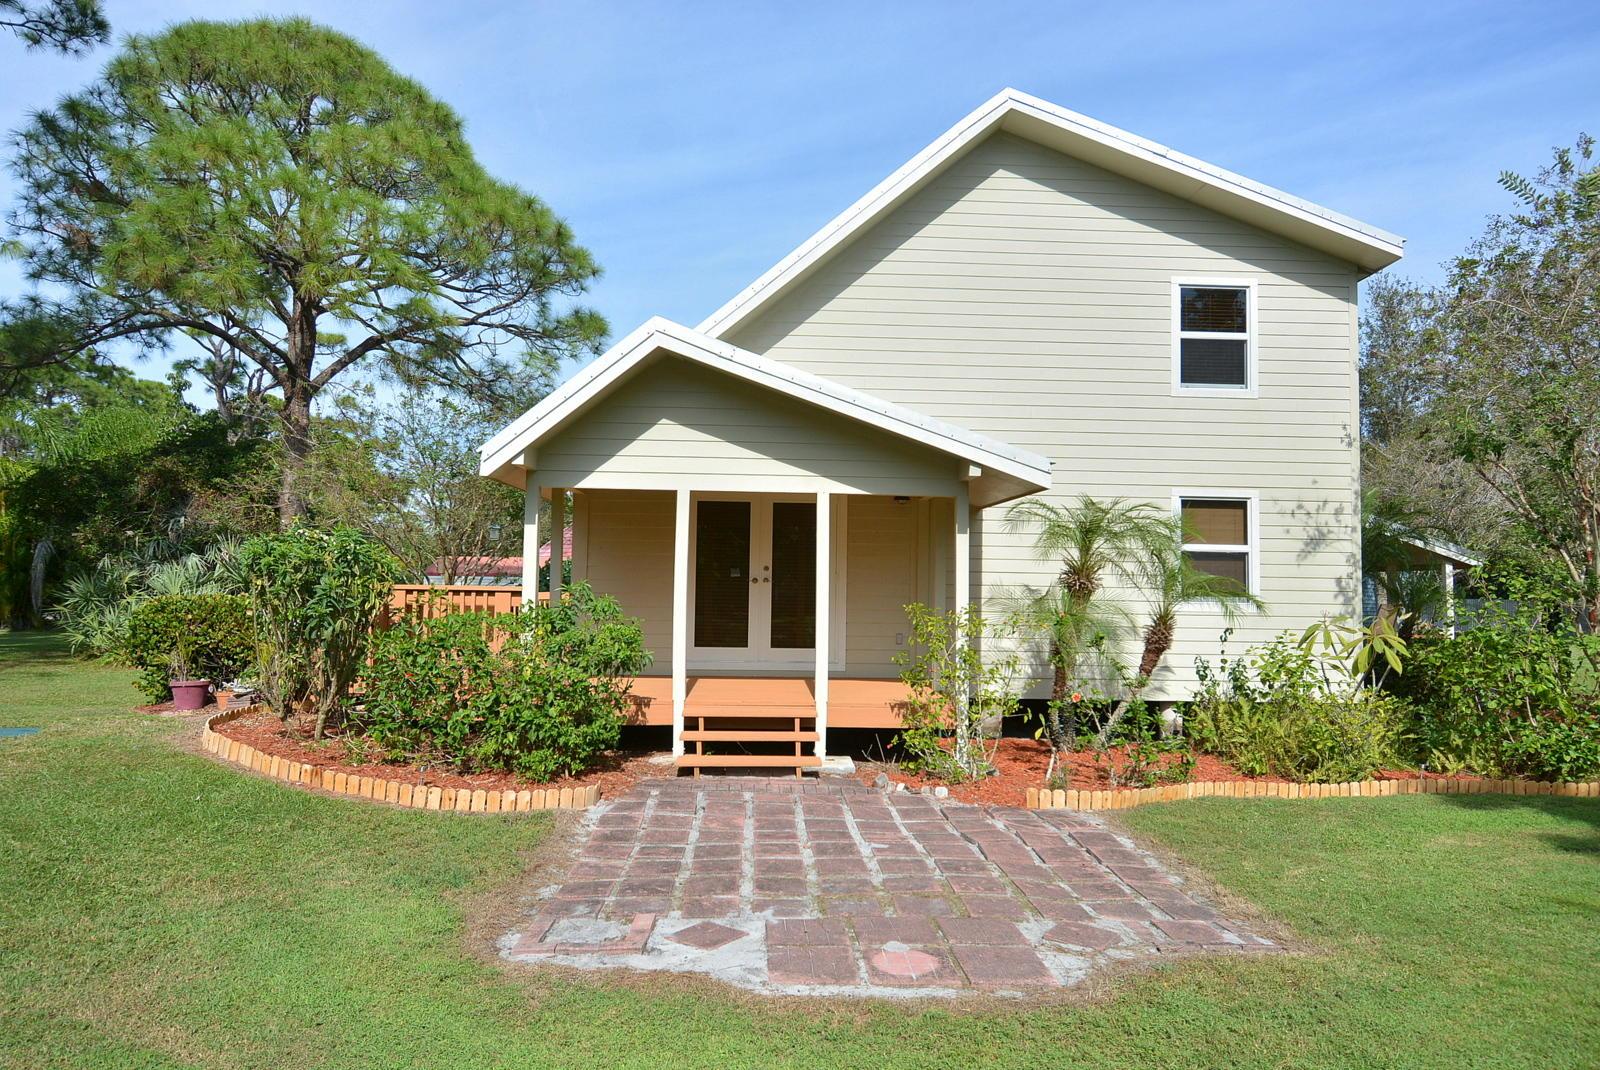 5500 Spruce Drive, Fort Pierce, FL 34982